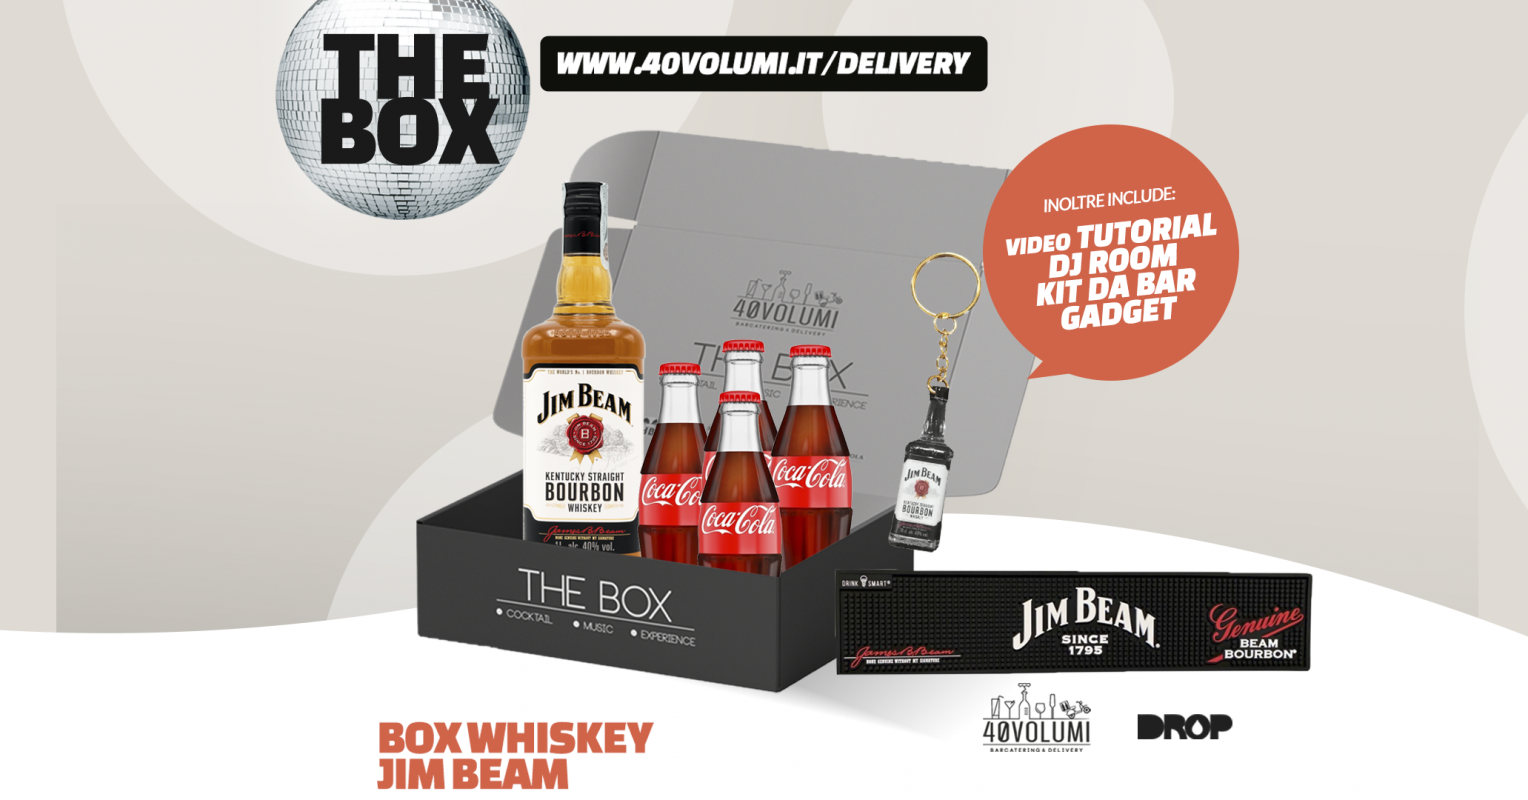 box whiskey him beam